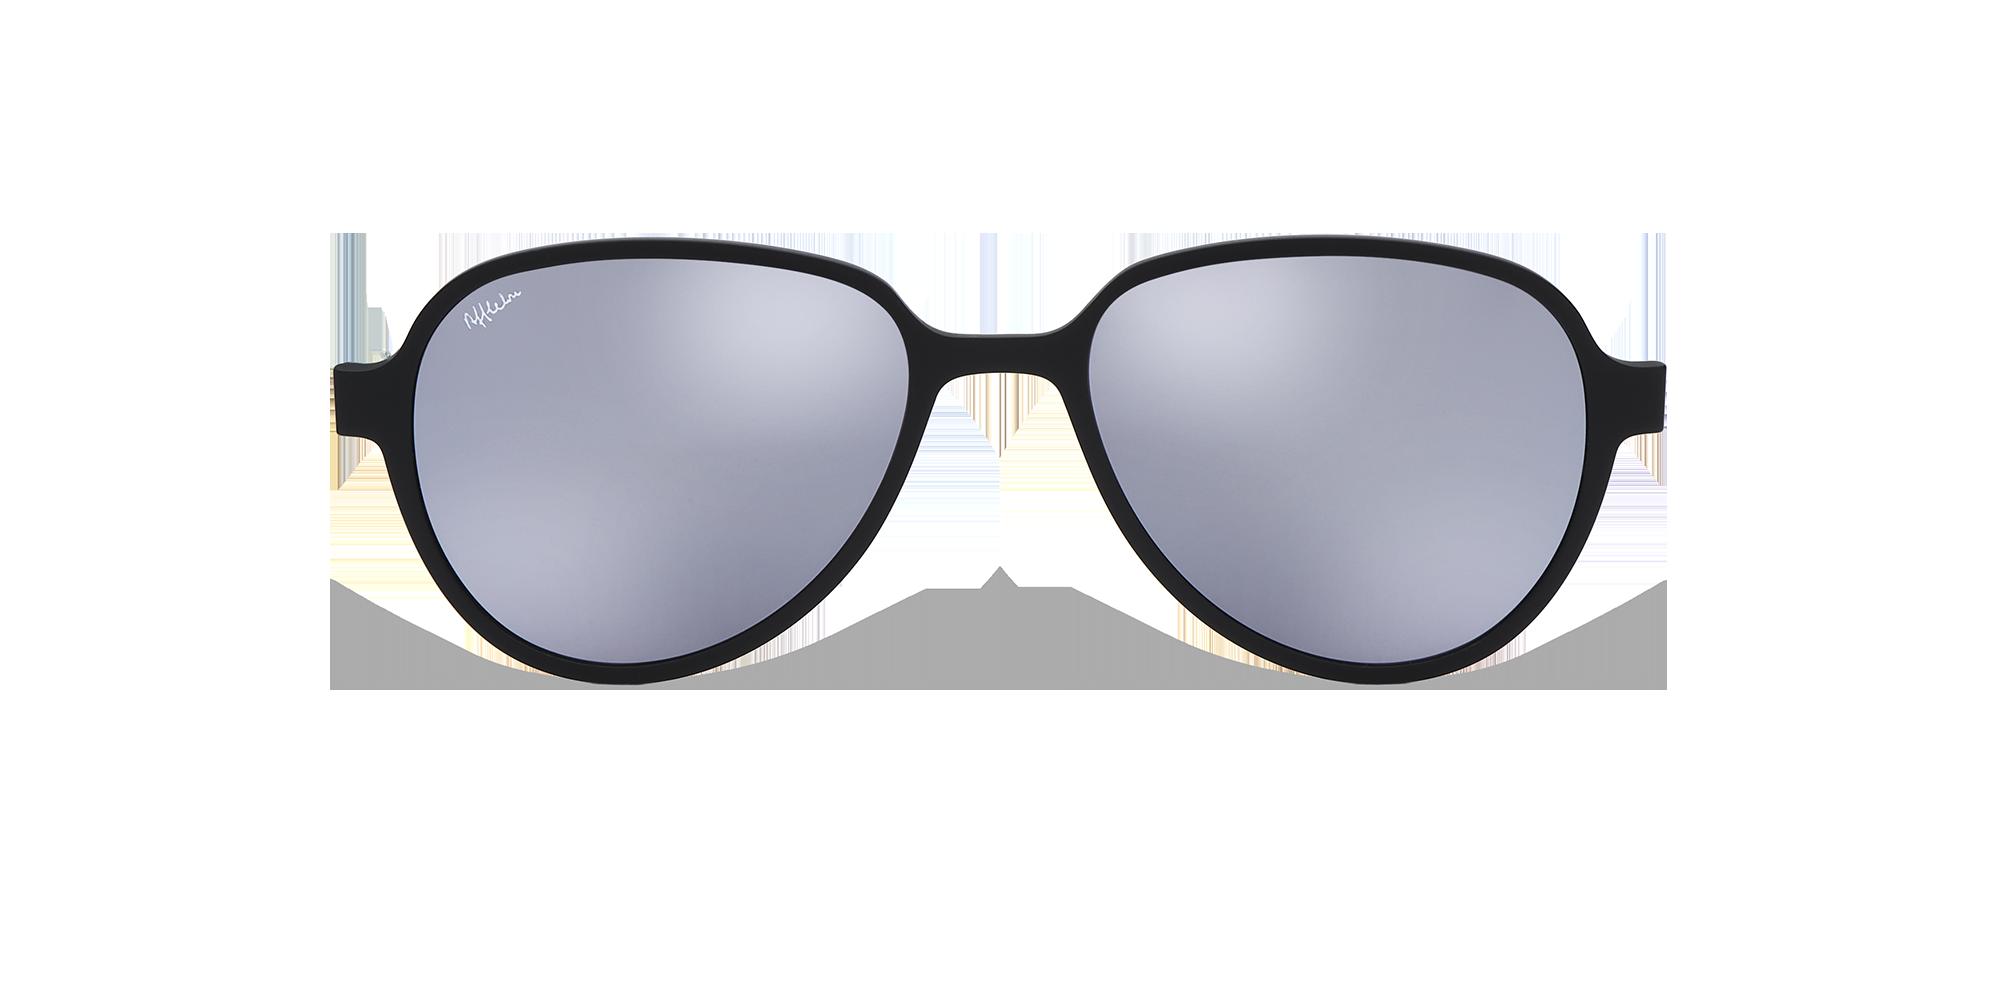 afflelou/france/products/smart_clip/clips_glasses/TMK43S4BK015417.png